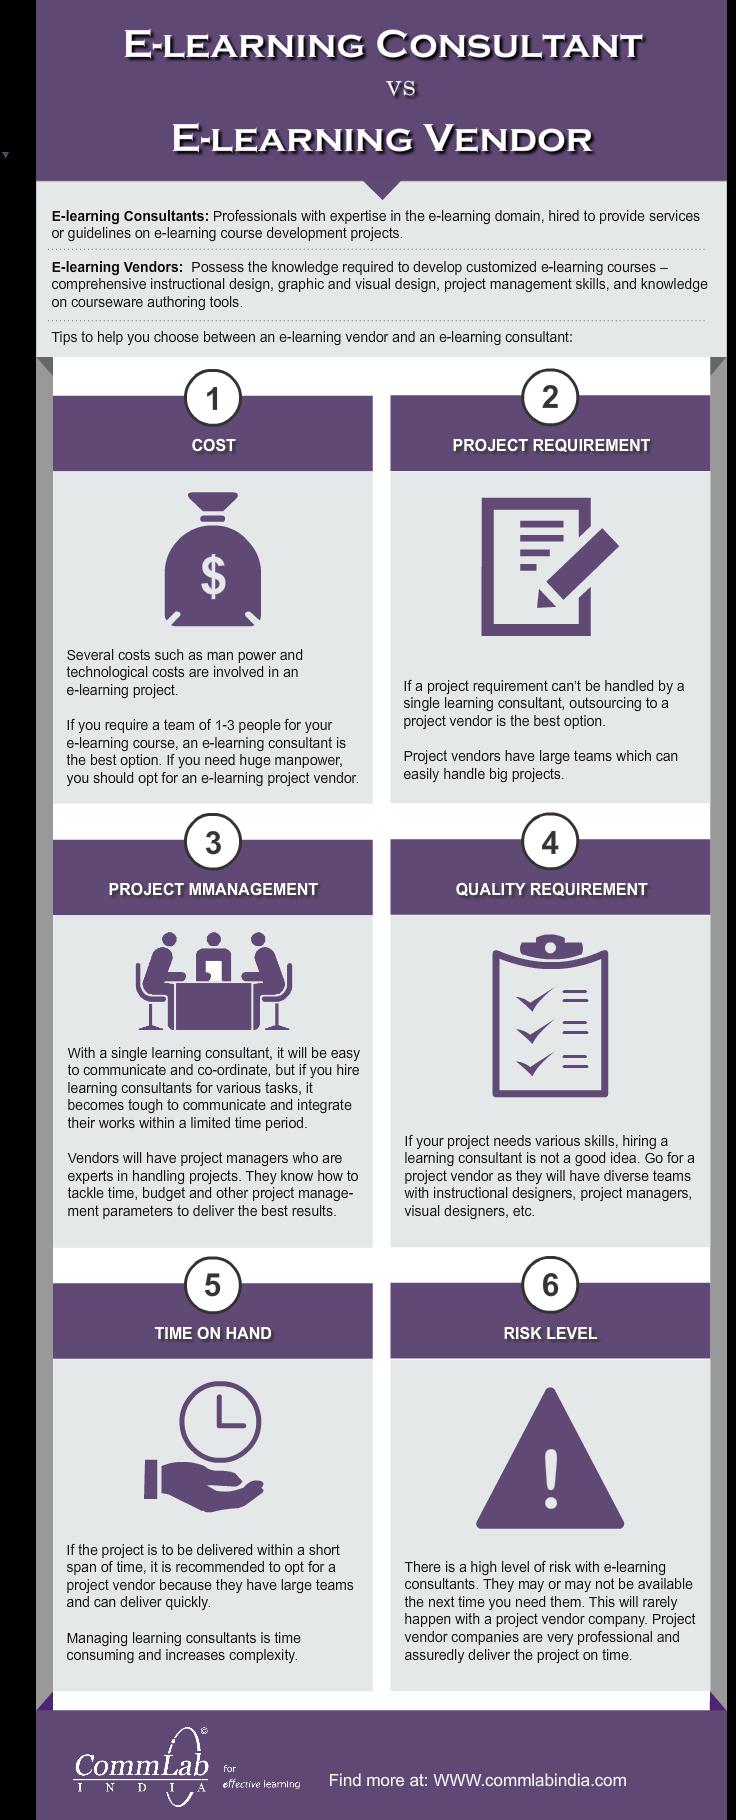 E-learning Consultant vs. E-learning Vendor [Infographic]